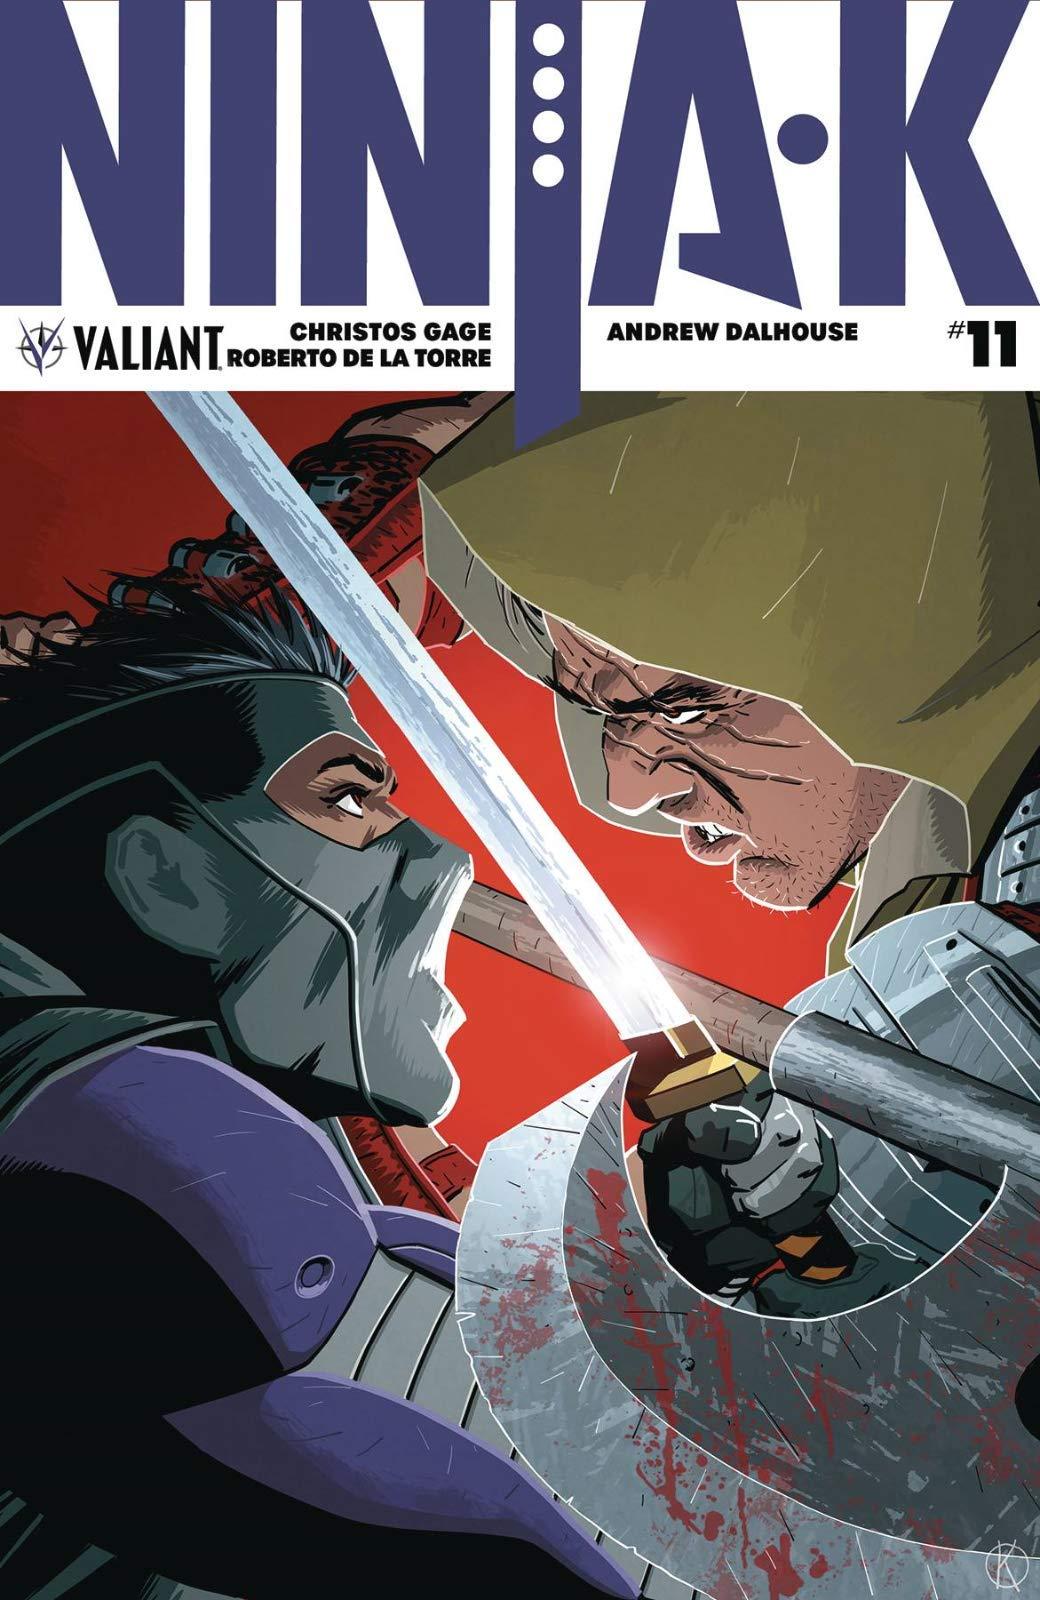 Ninja-k #11 Cover A: Christos Gage: Amazon.com: Books